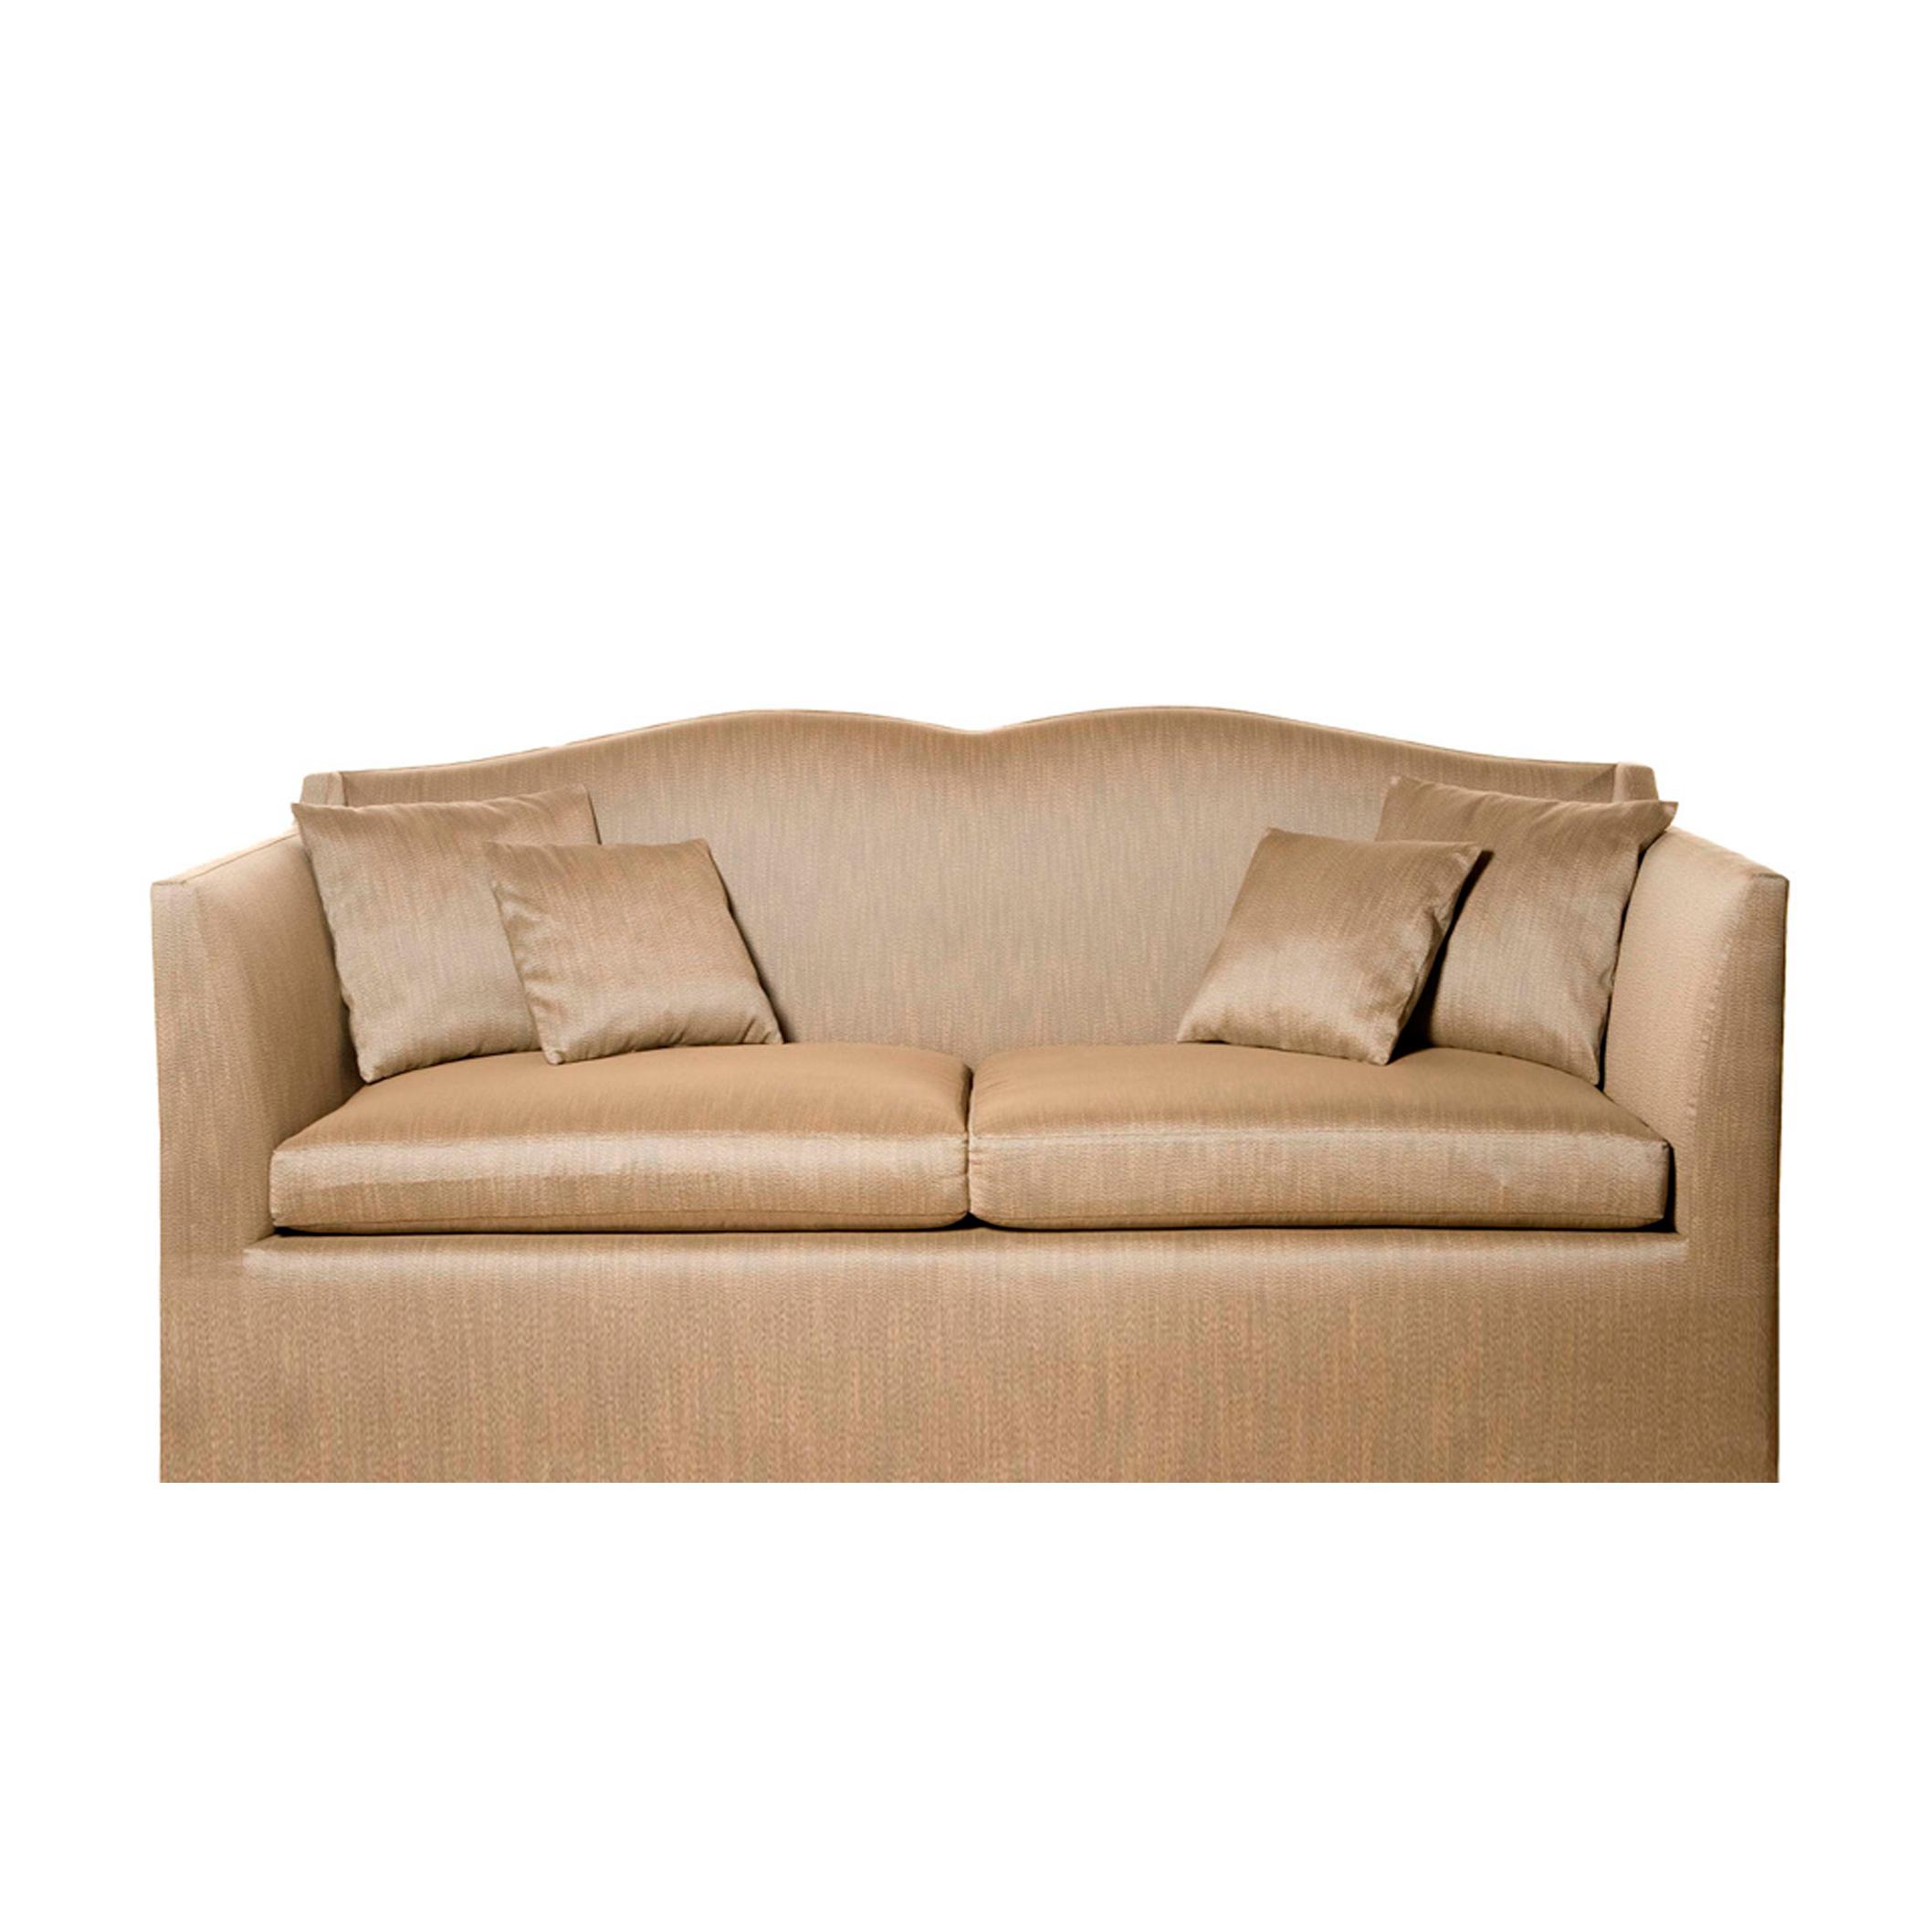 Two Seats Sofa    more info